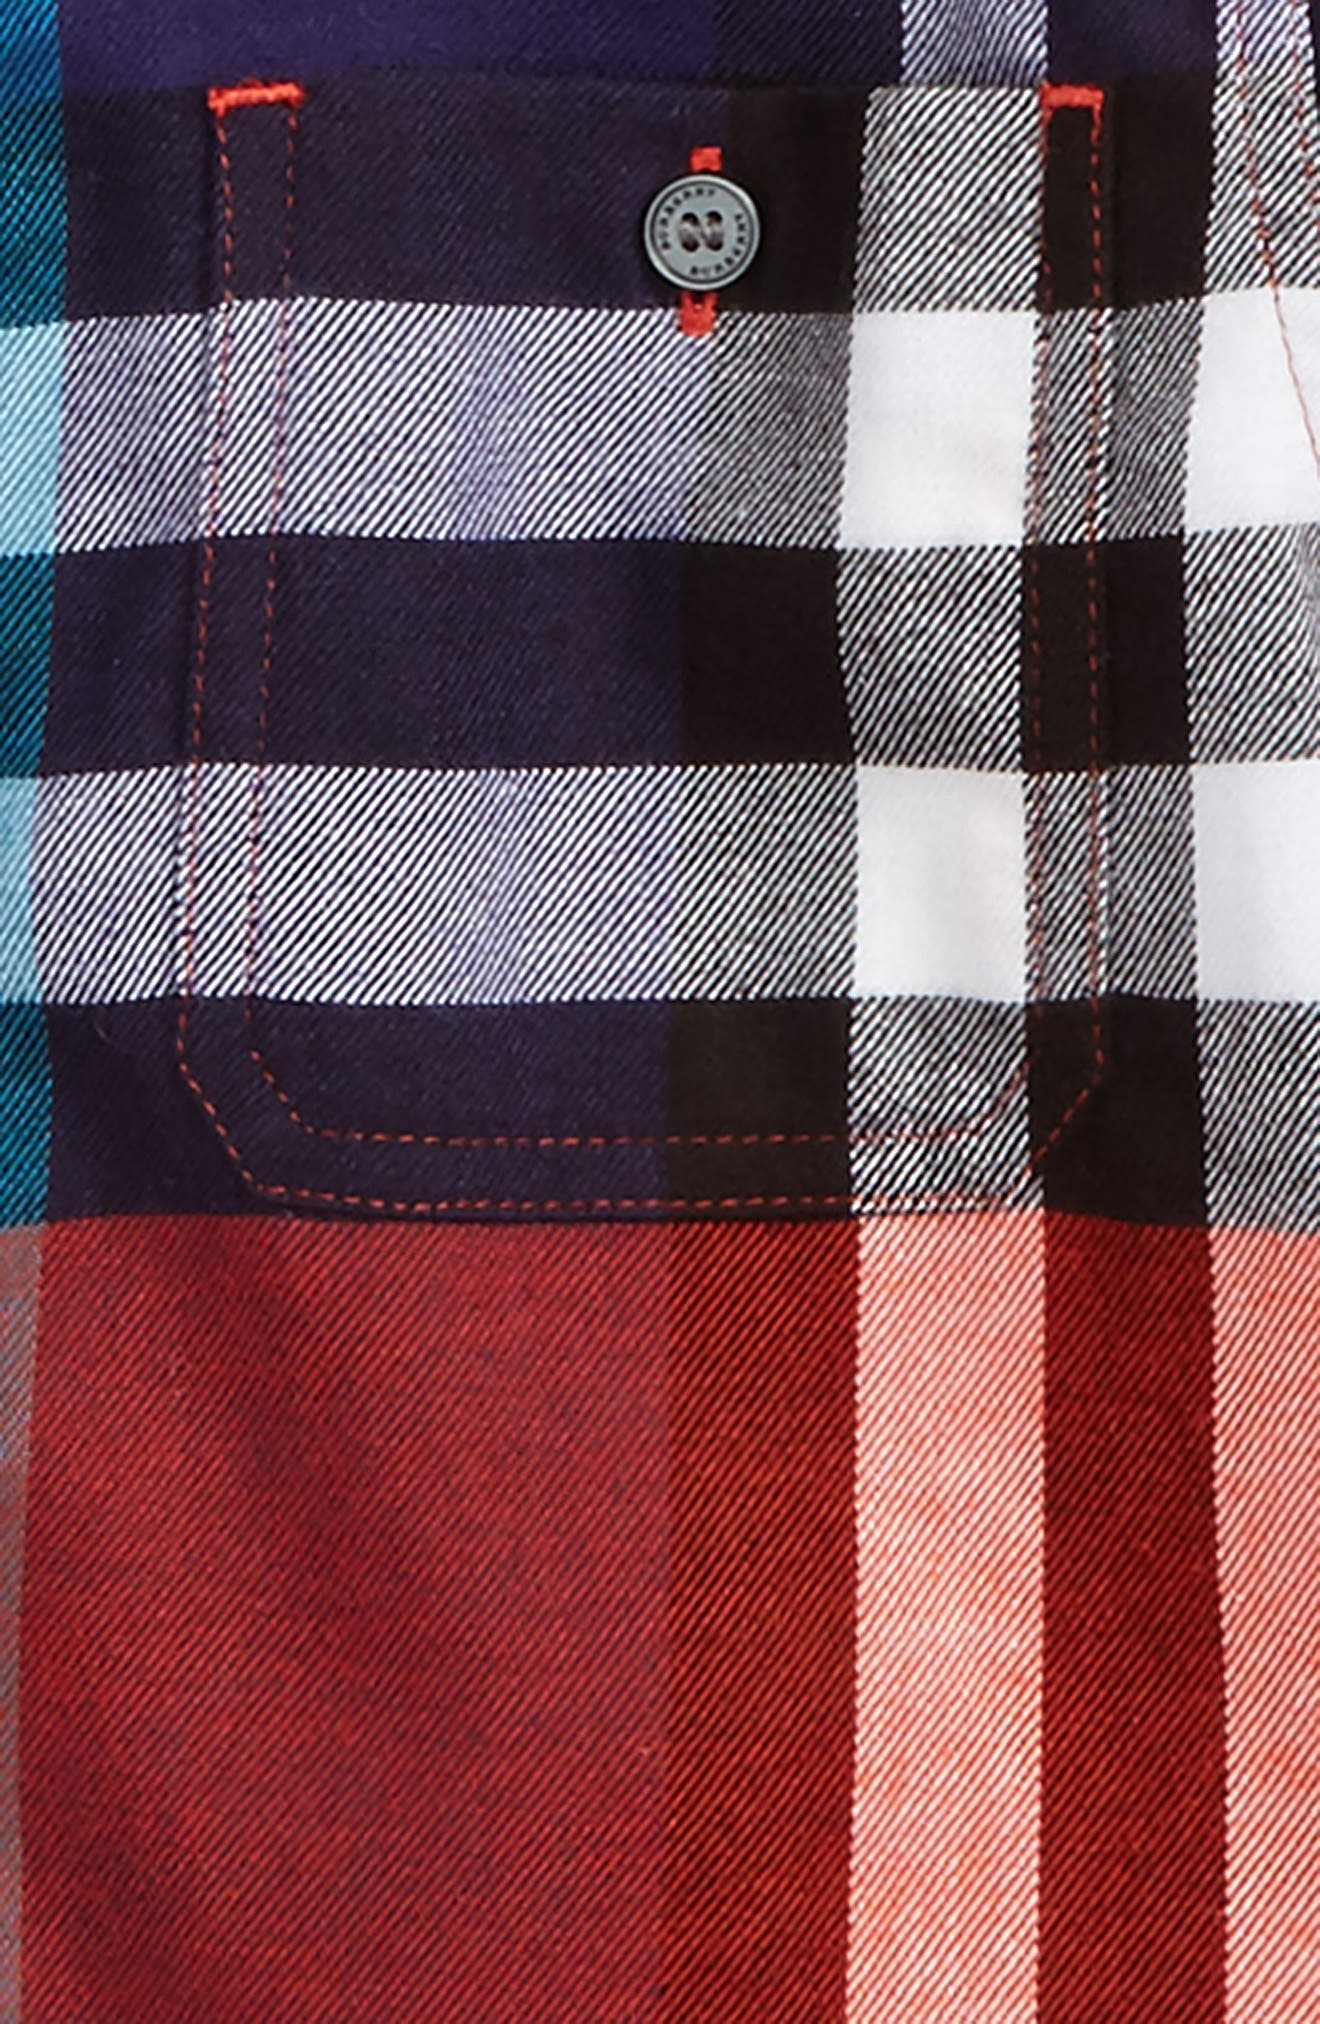 Mini Camber Check Shirt,                             Alternate thumbnail 2, color,                             800